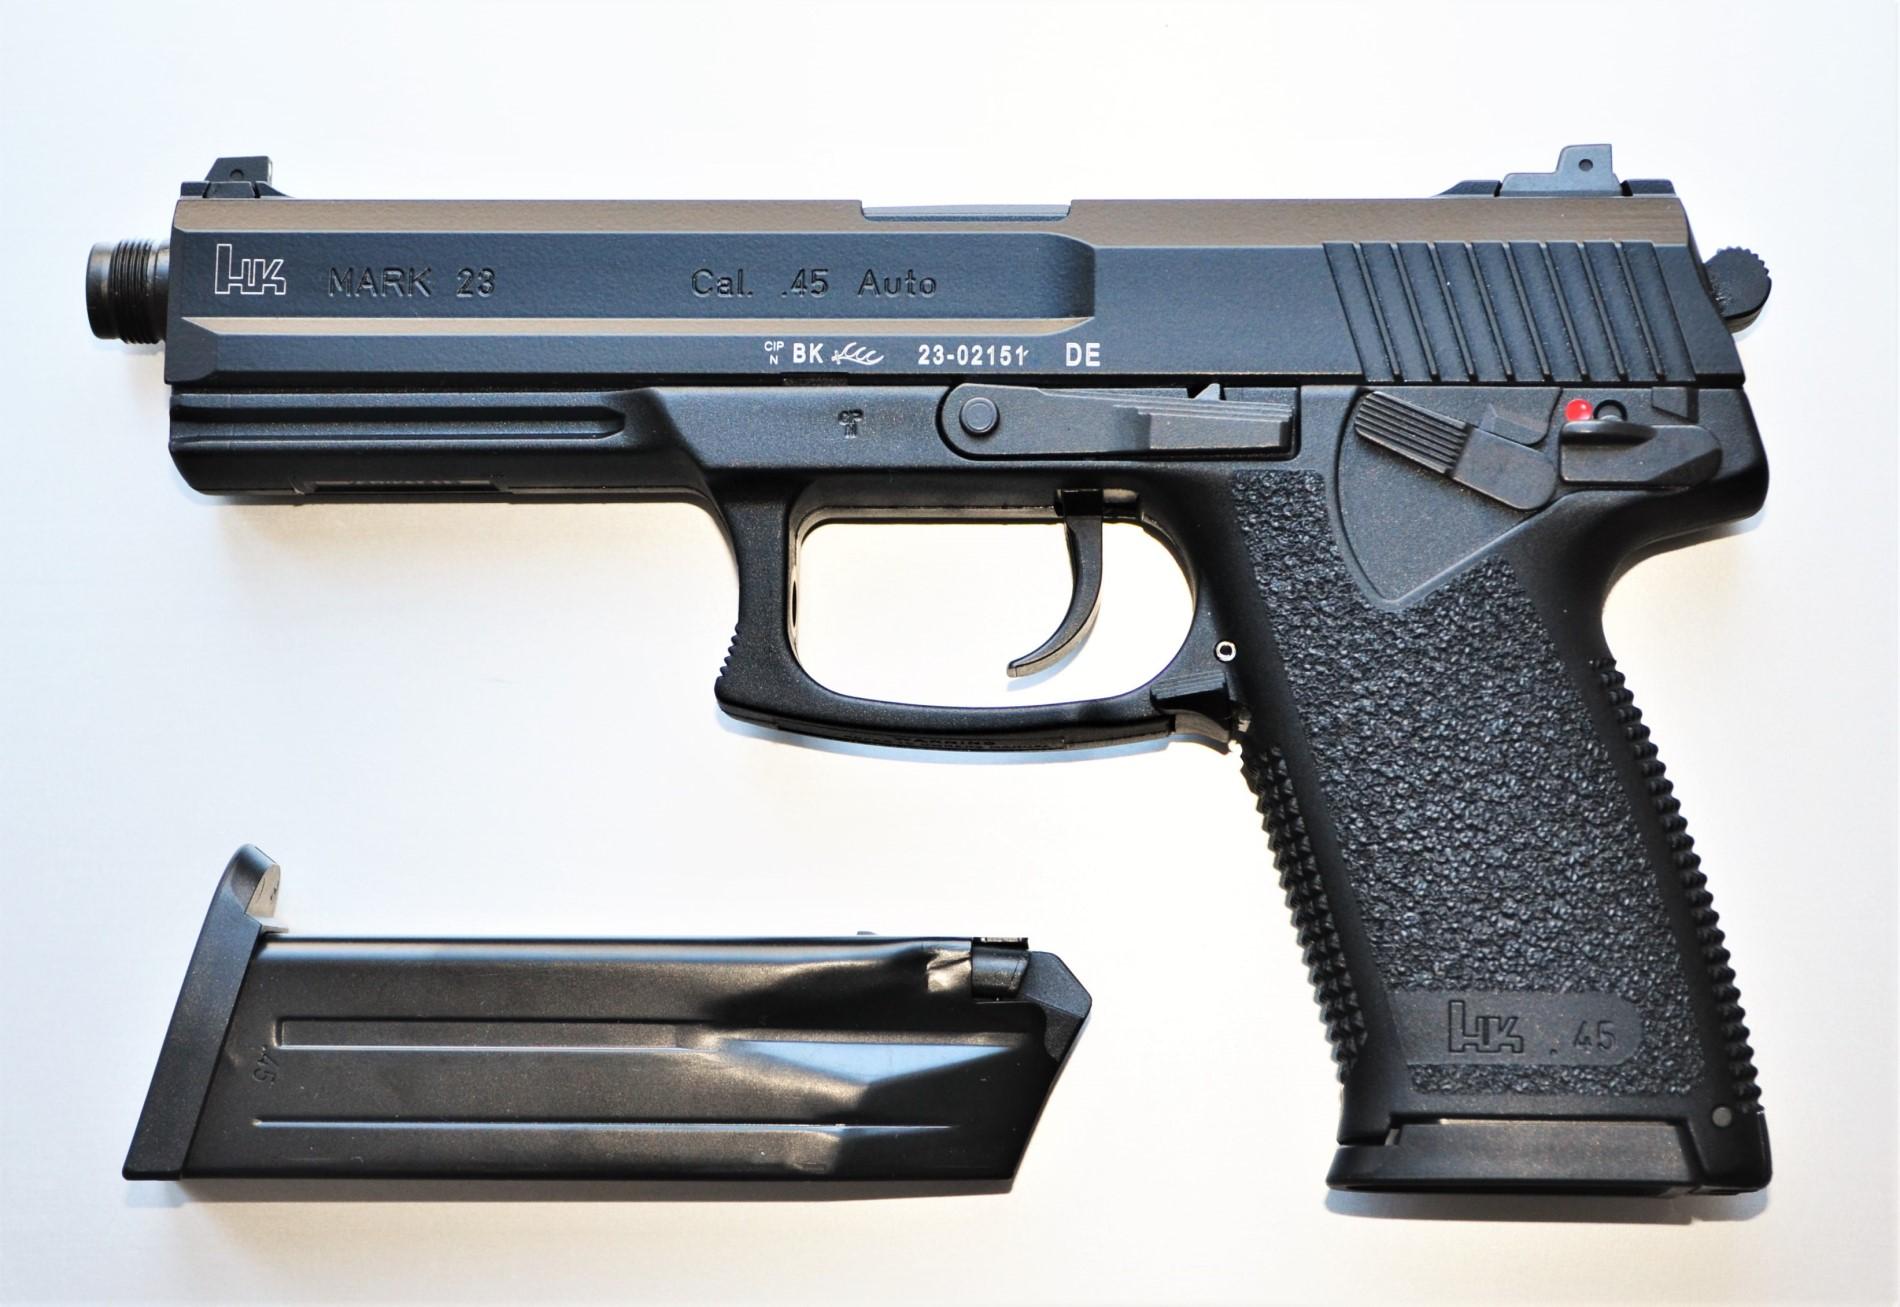 HK Mark 23 Mod 0 SOCOM .45 Auto - halbautomatische Pistole